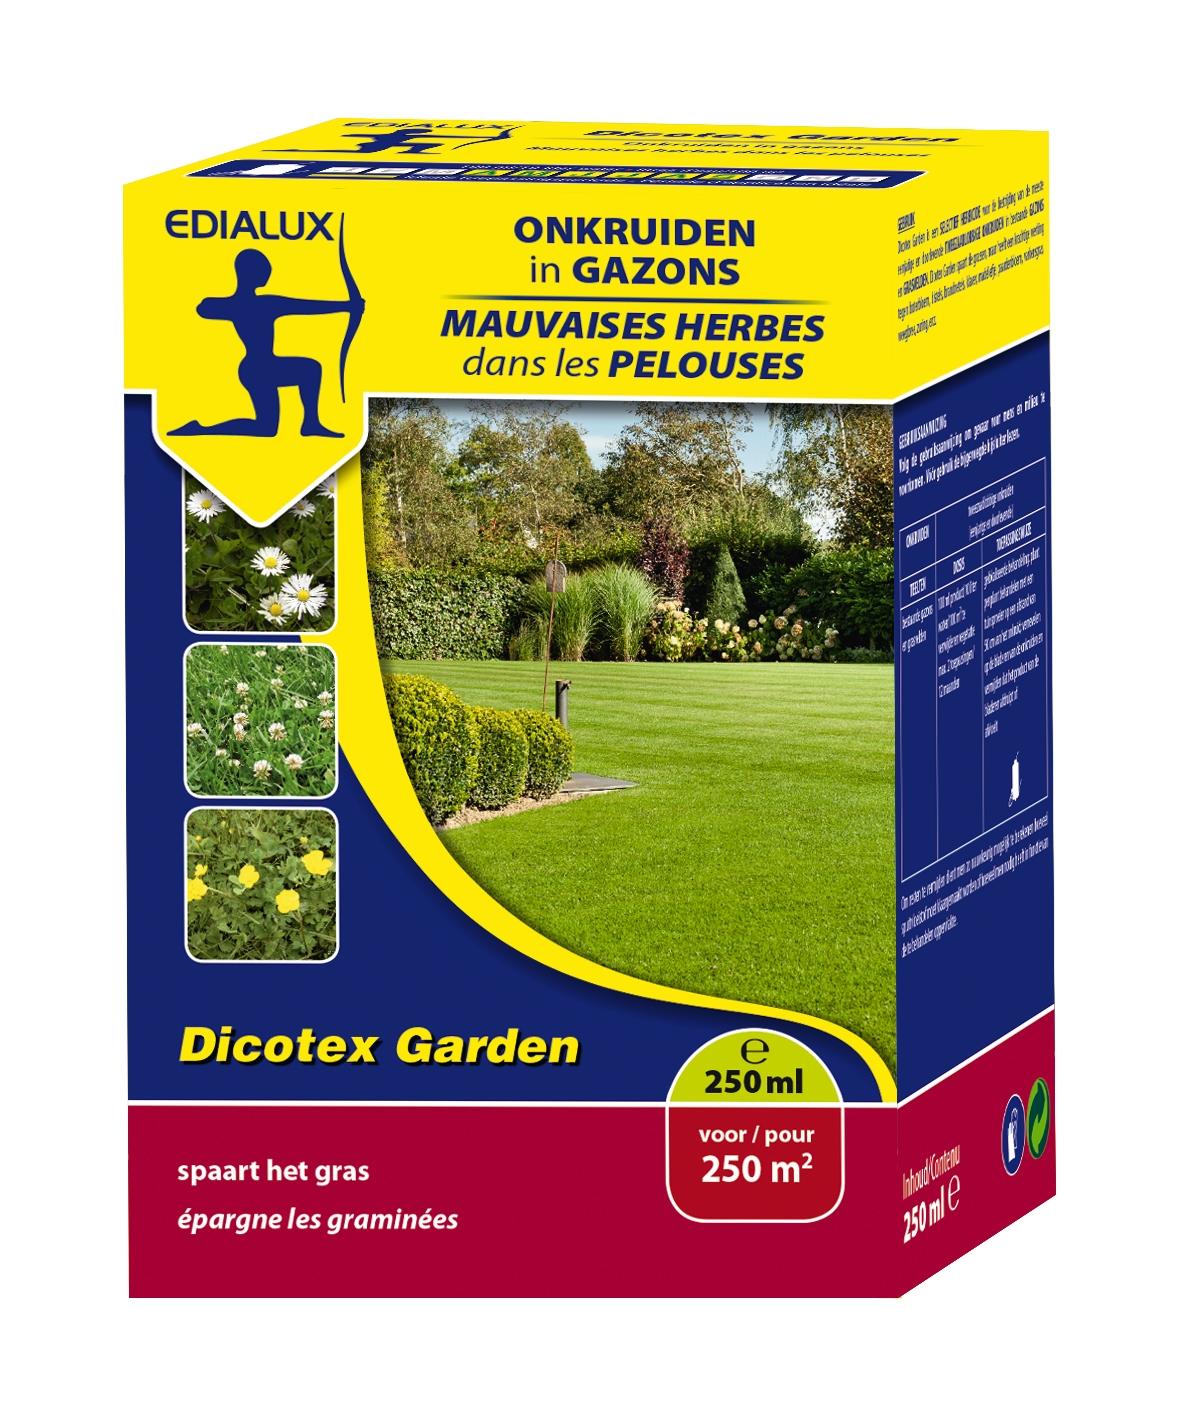 Edialux Dicotex Garden